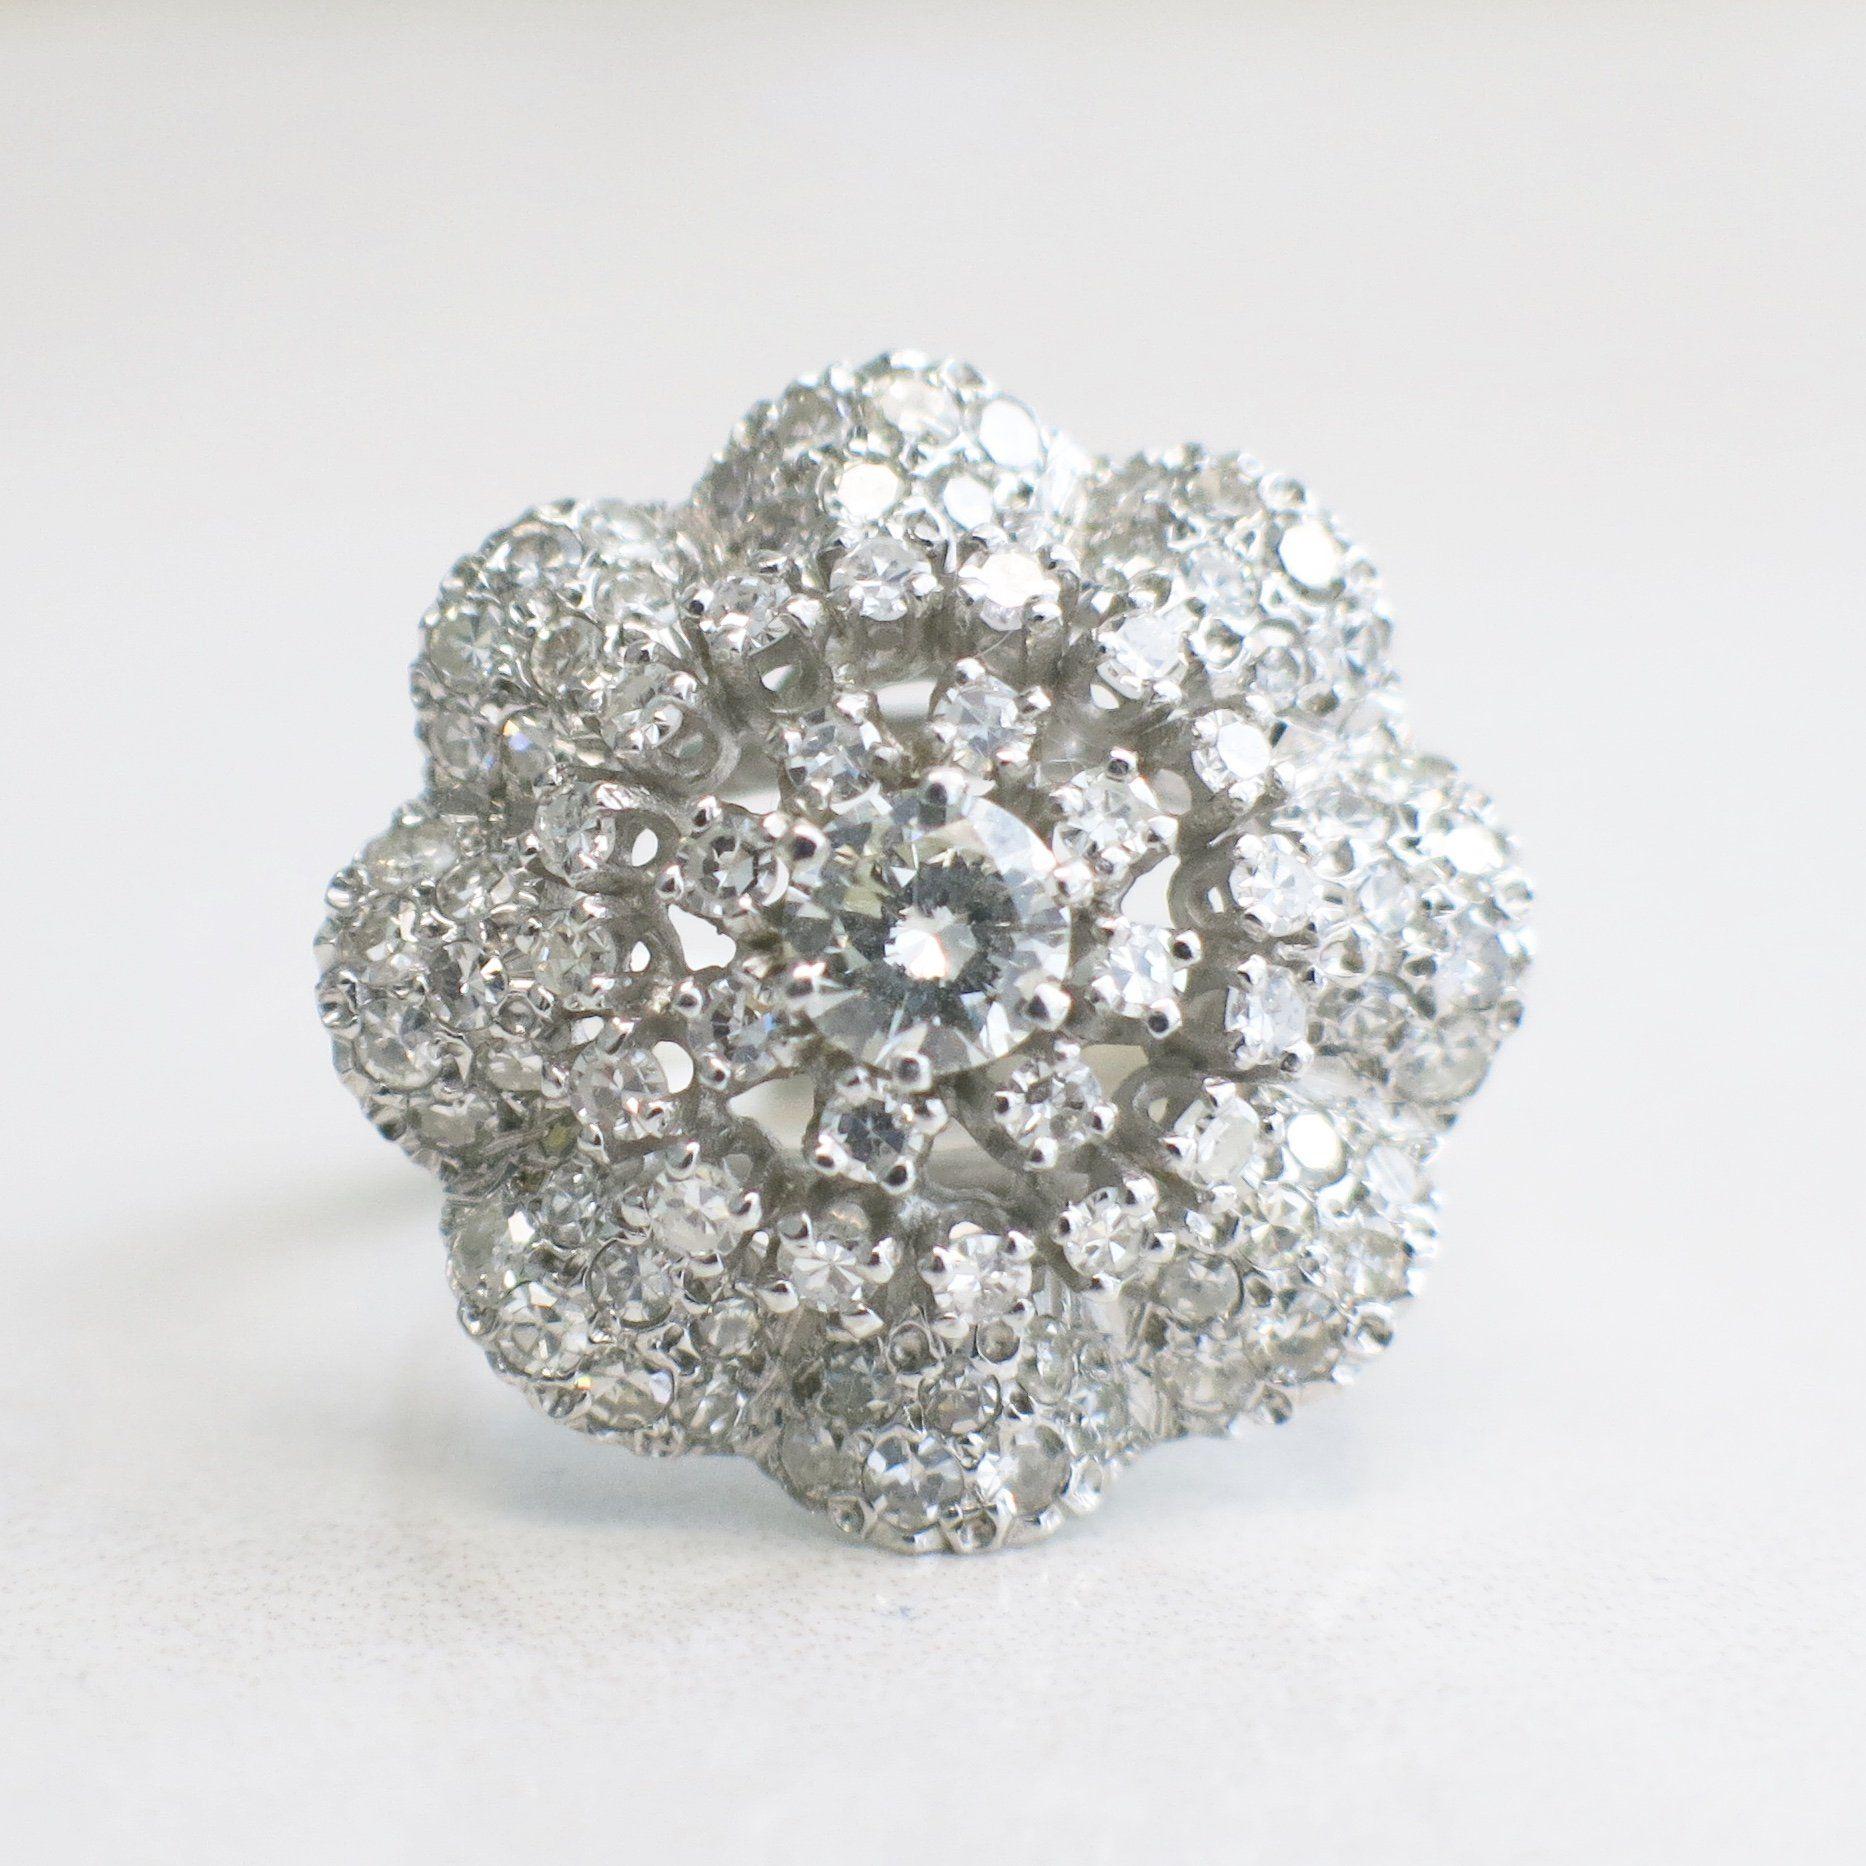 18k white gold vintage edwardian art nouveau diamond